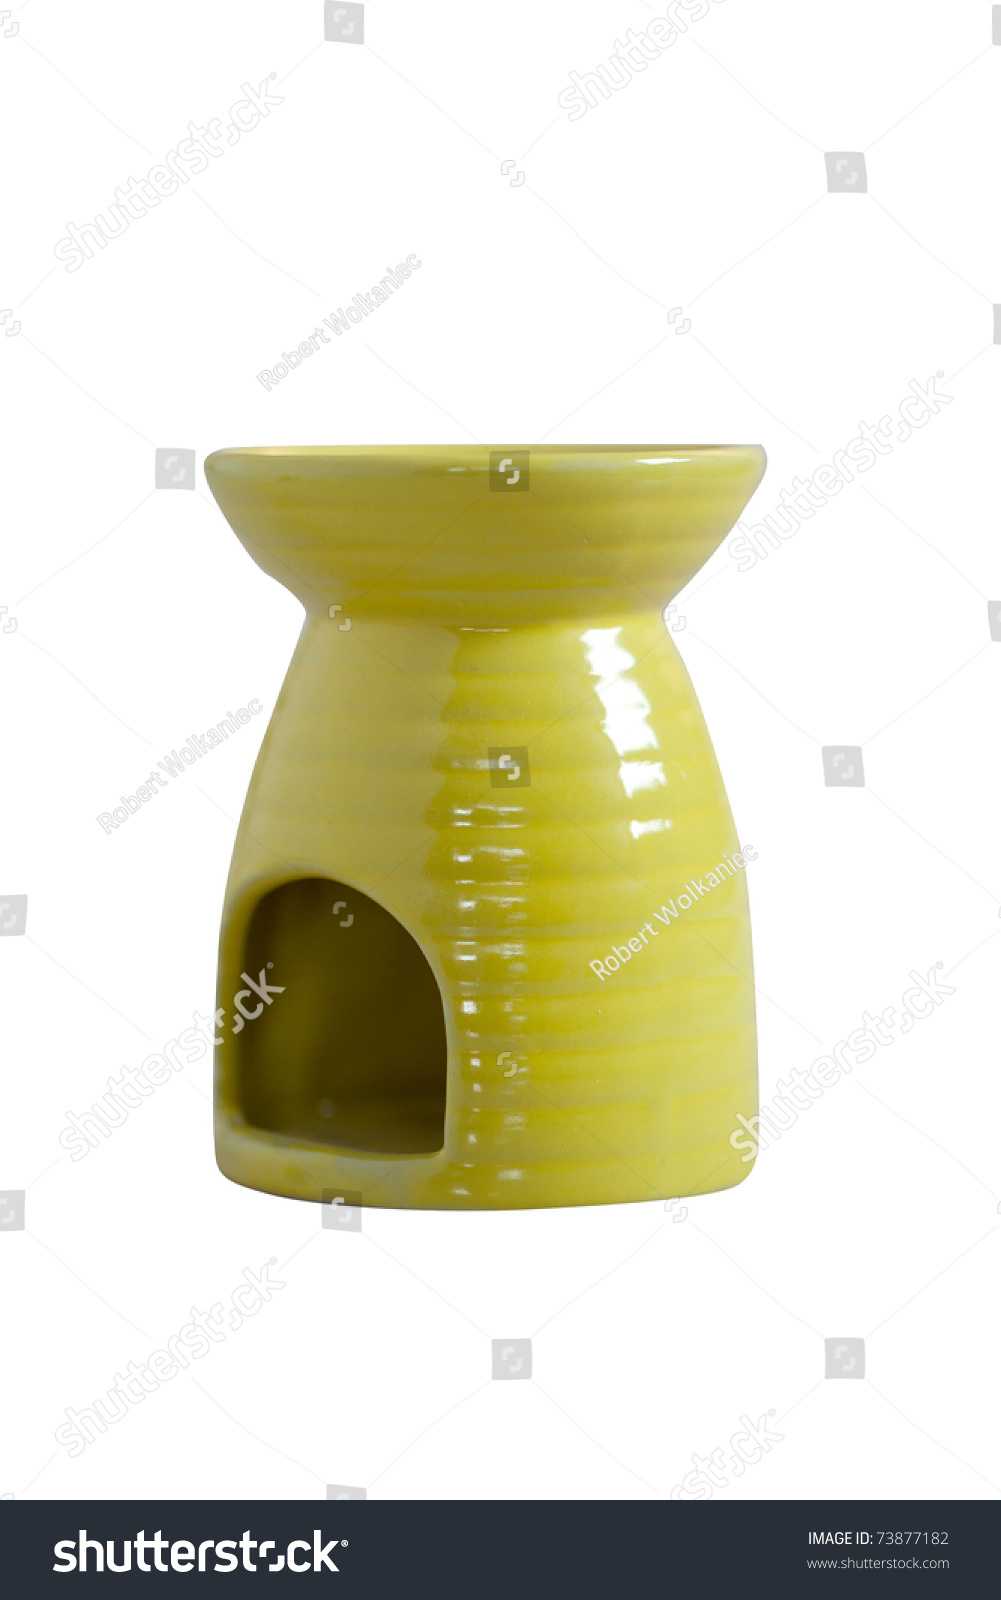 Fireplace Fragrance Fragrance Oil Lamp Stock Photo 73877182 ...